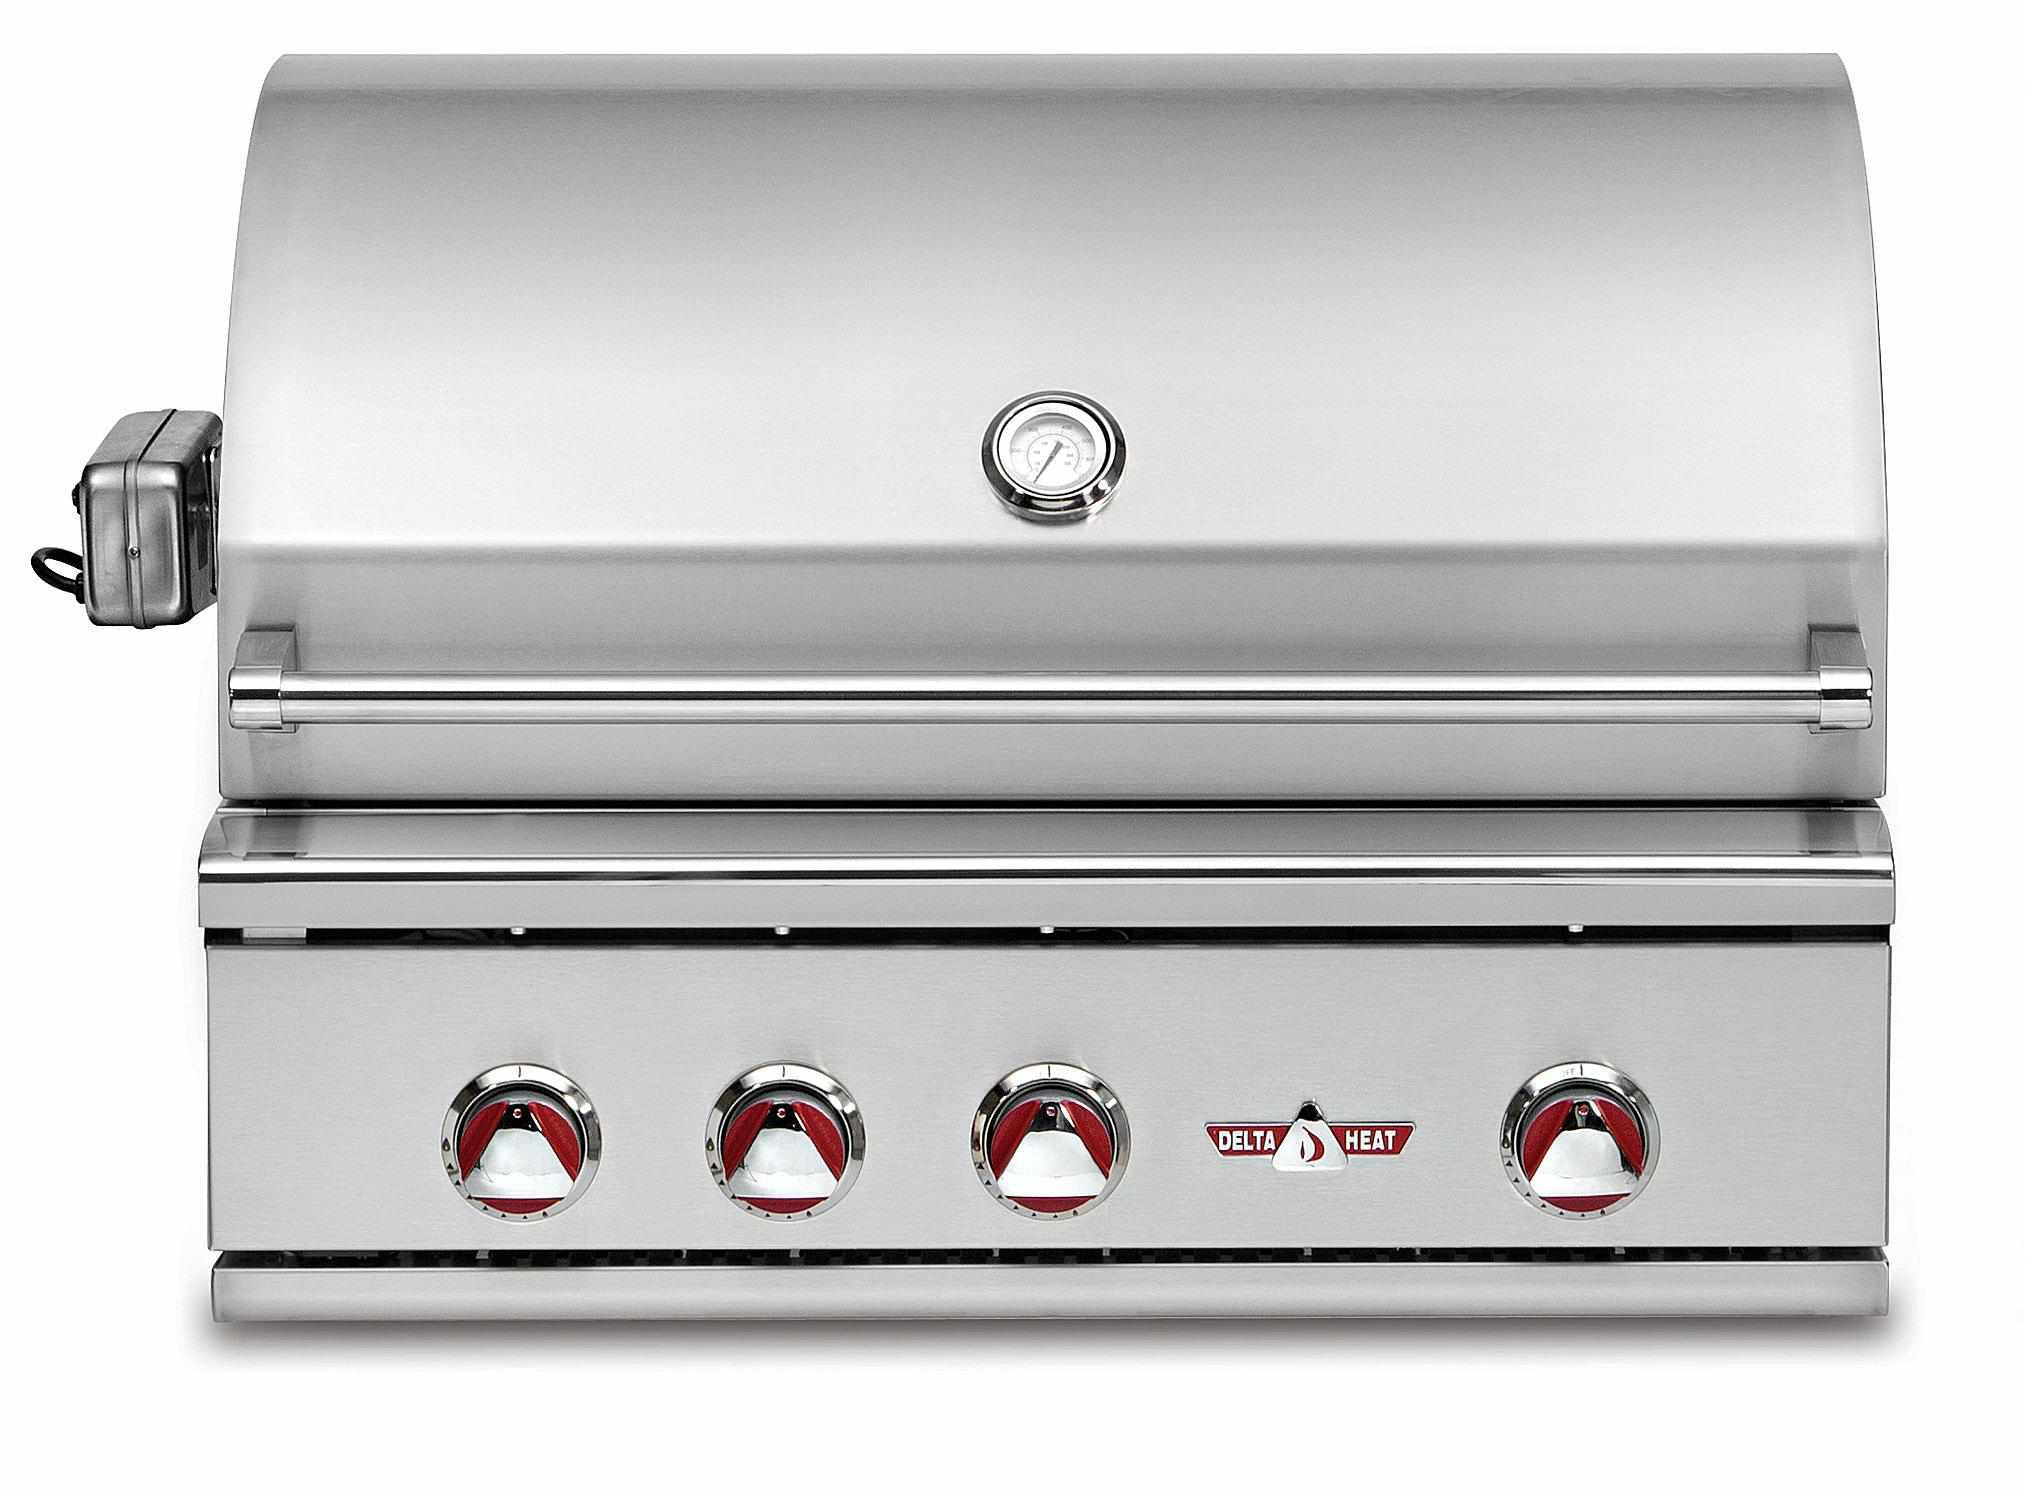 best outdoor kitchen grills brick delta heat 32inch model dhbq32rb the 10 best gas grill inserts under 4000 to buy in 2019